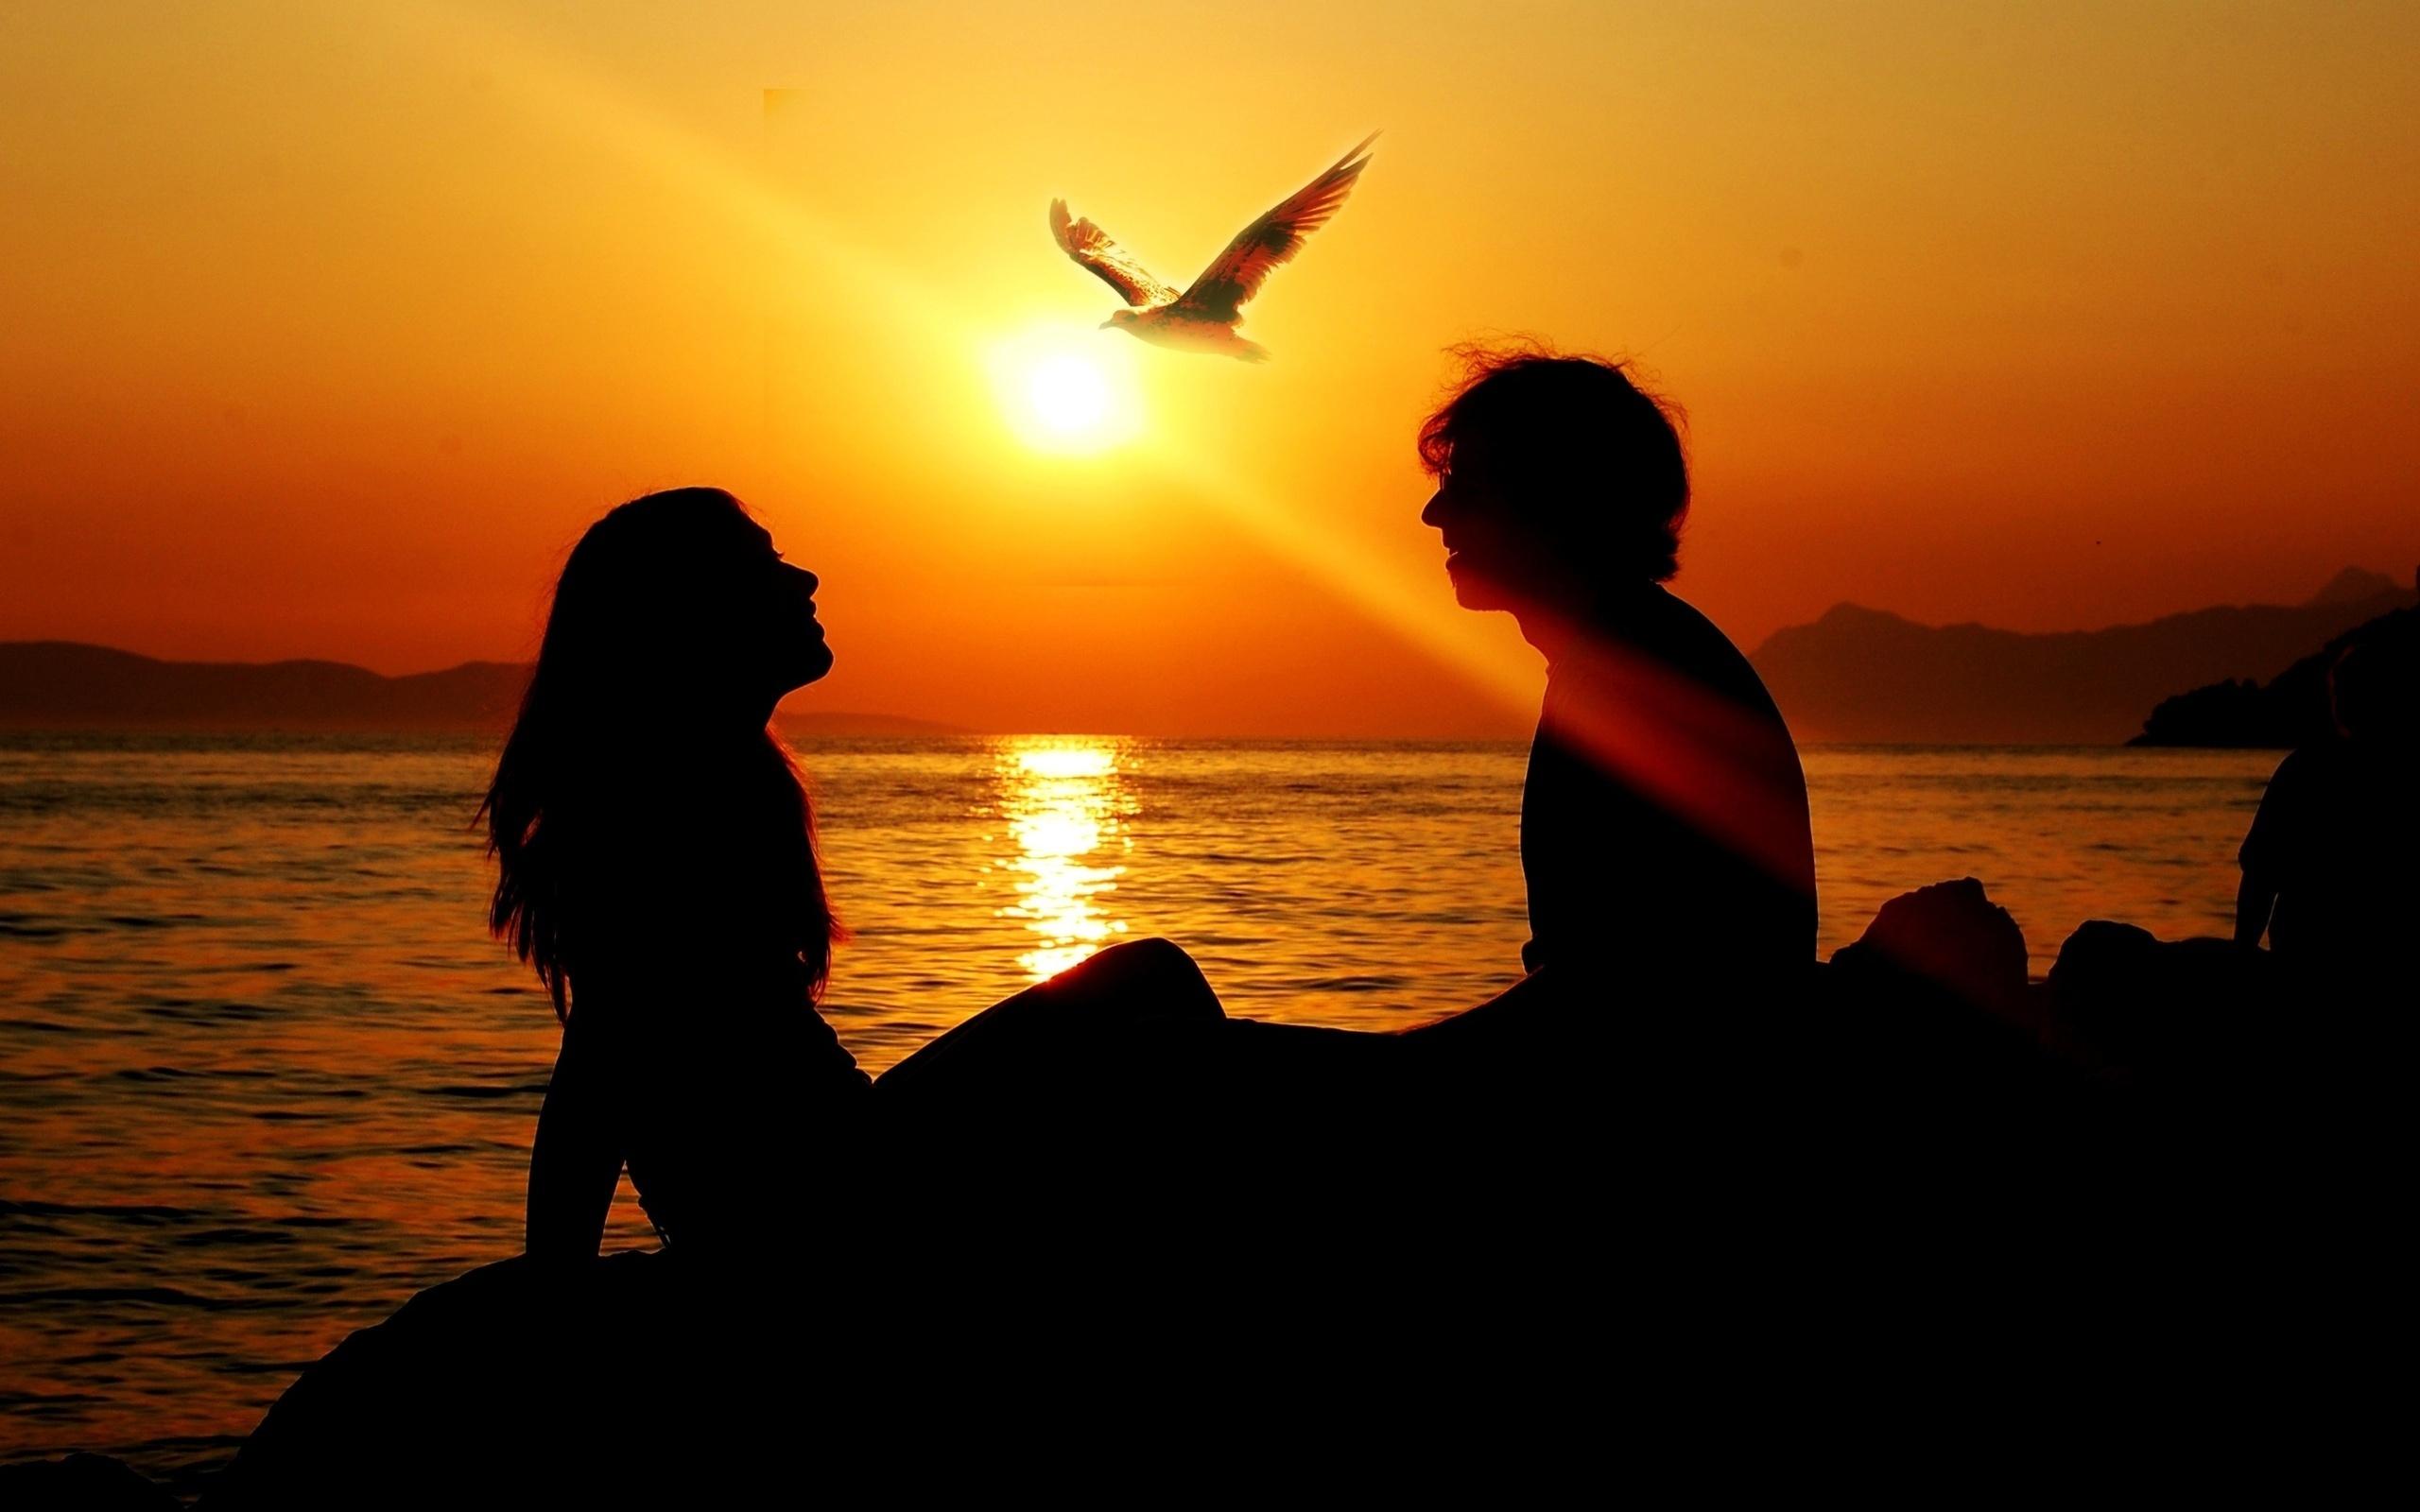 Обои на монитор | Любовь | закат, море, девушка, парень, птица